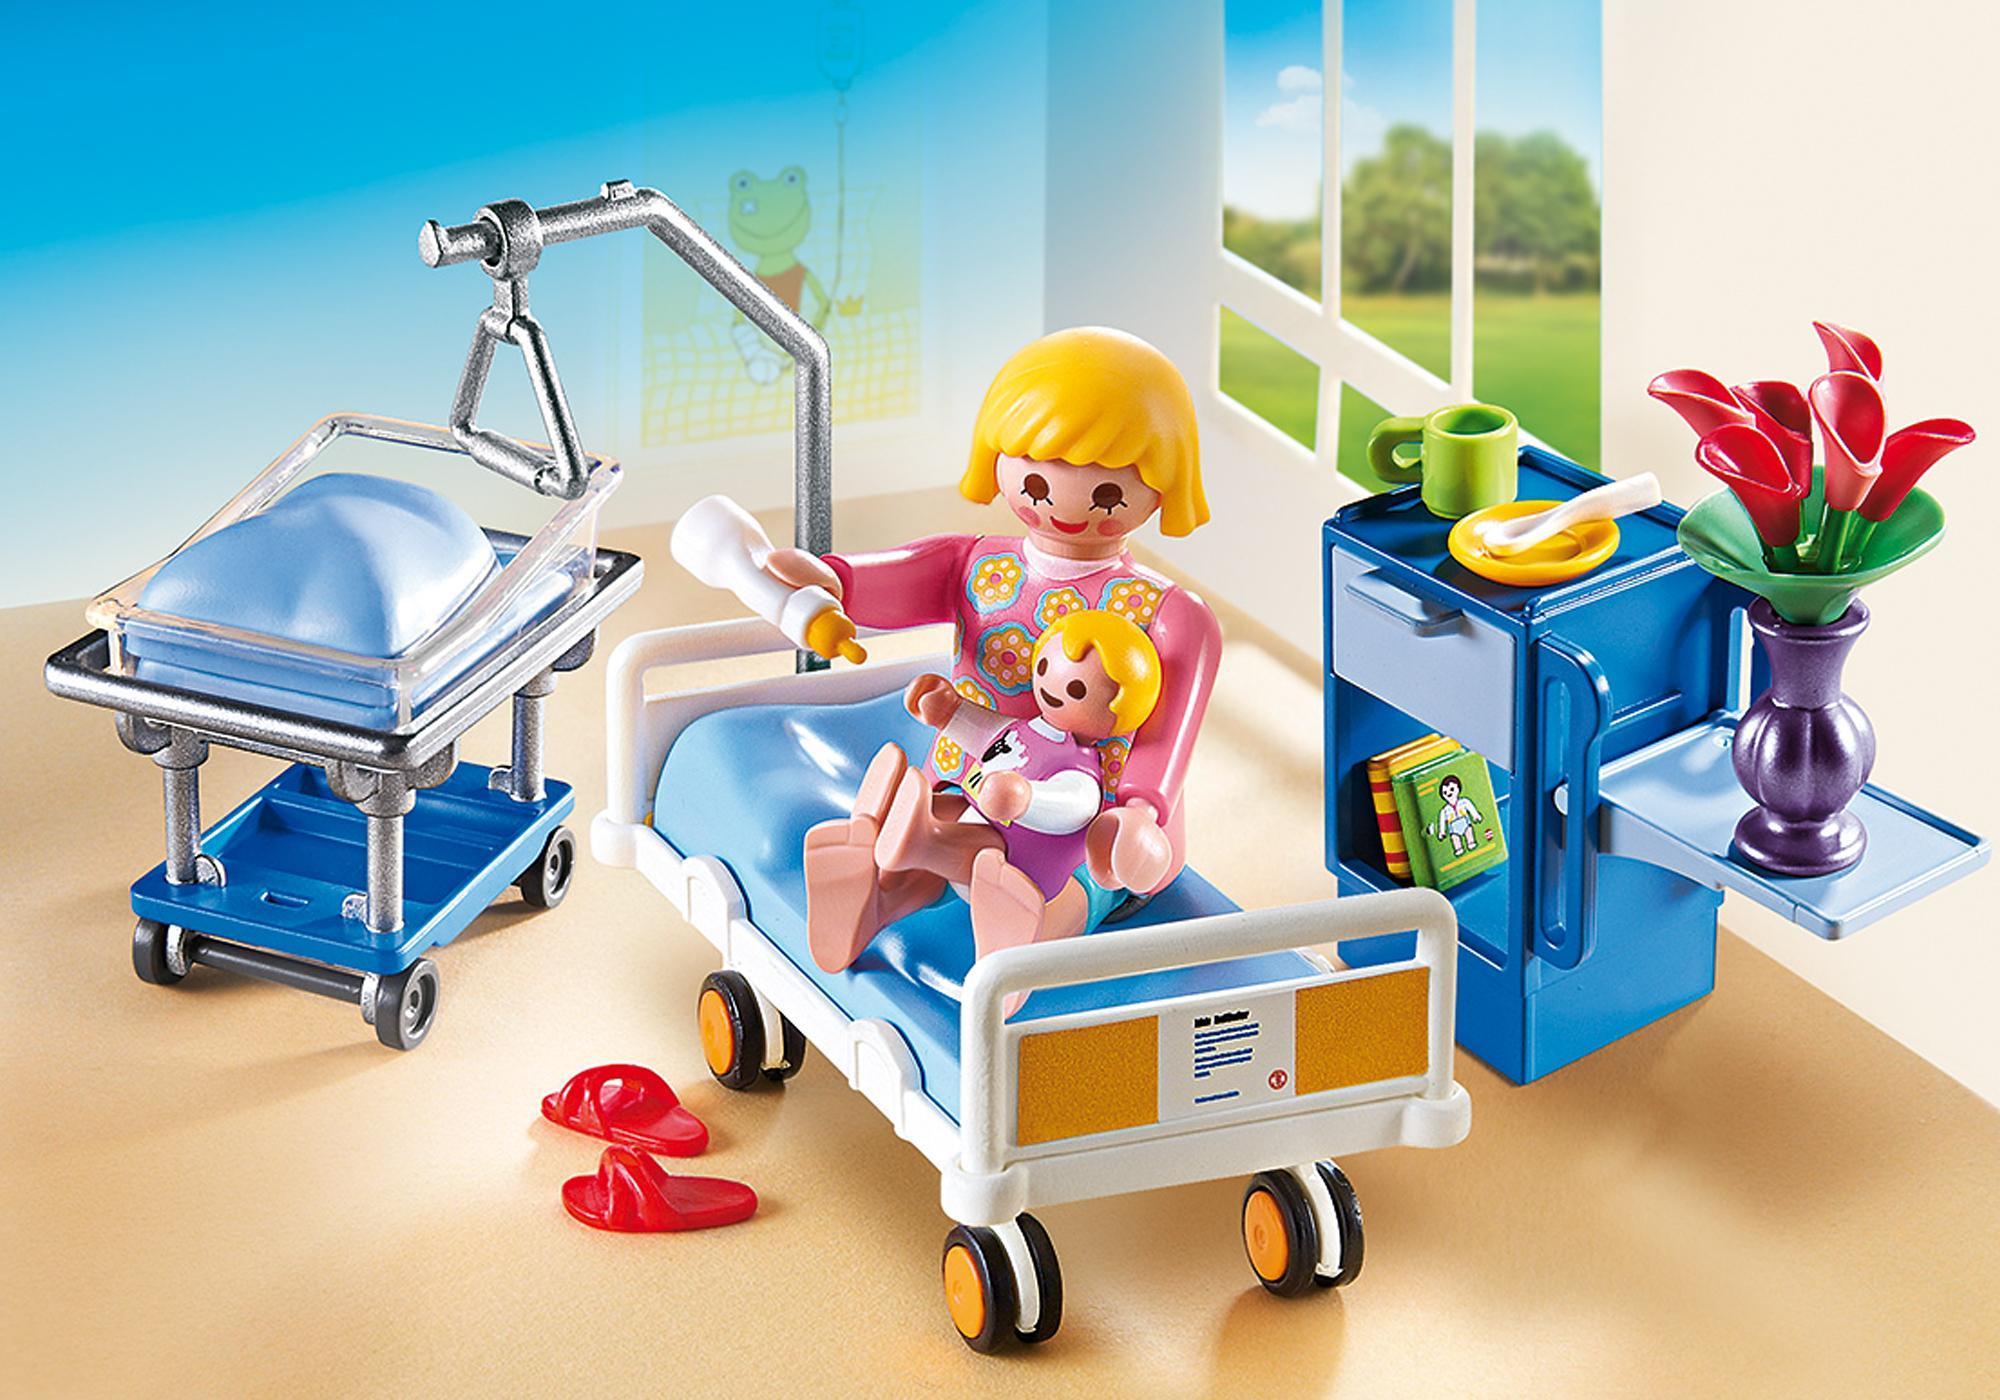 http://media.playmobil.com/i/playmobil/6660_product_detail